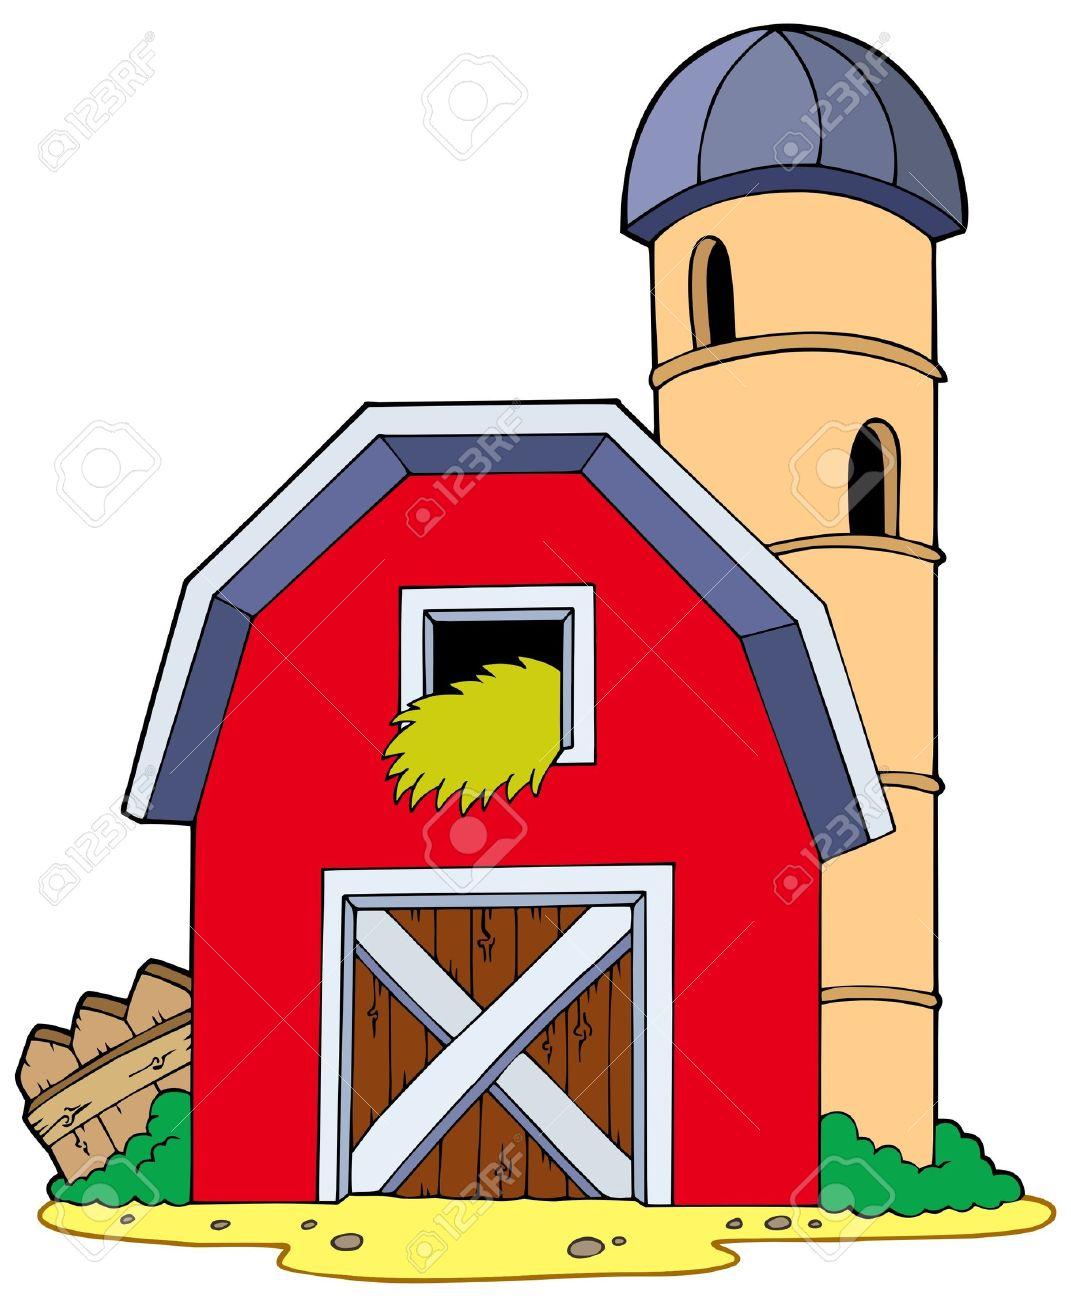 Cute Farm With Barn and Silo - Free Clip Art | Farm art, Farm pictures, Barn  drawing